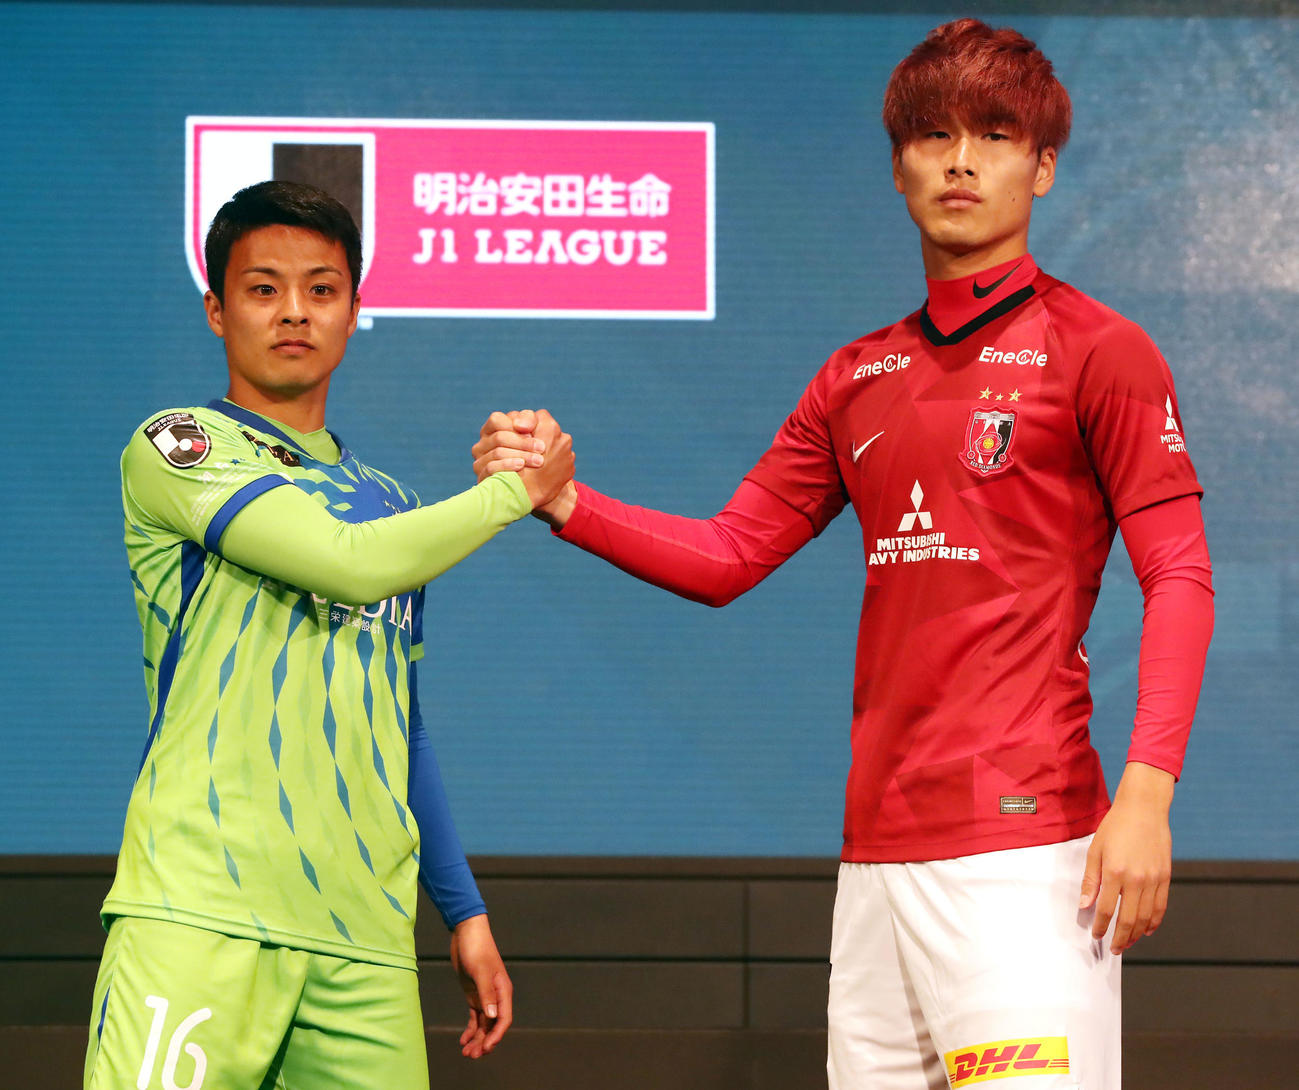 2020Jリーグキックオフカンファレンスで開幕カードの湘南MF齊藤(左)と浦和DF橋岡は握手(撮影・浅見桂子)